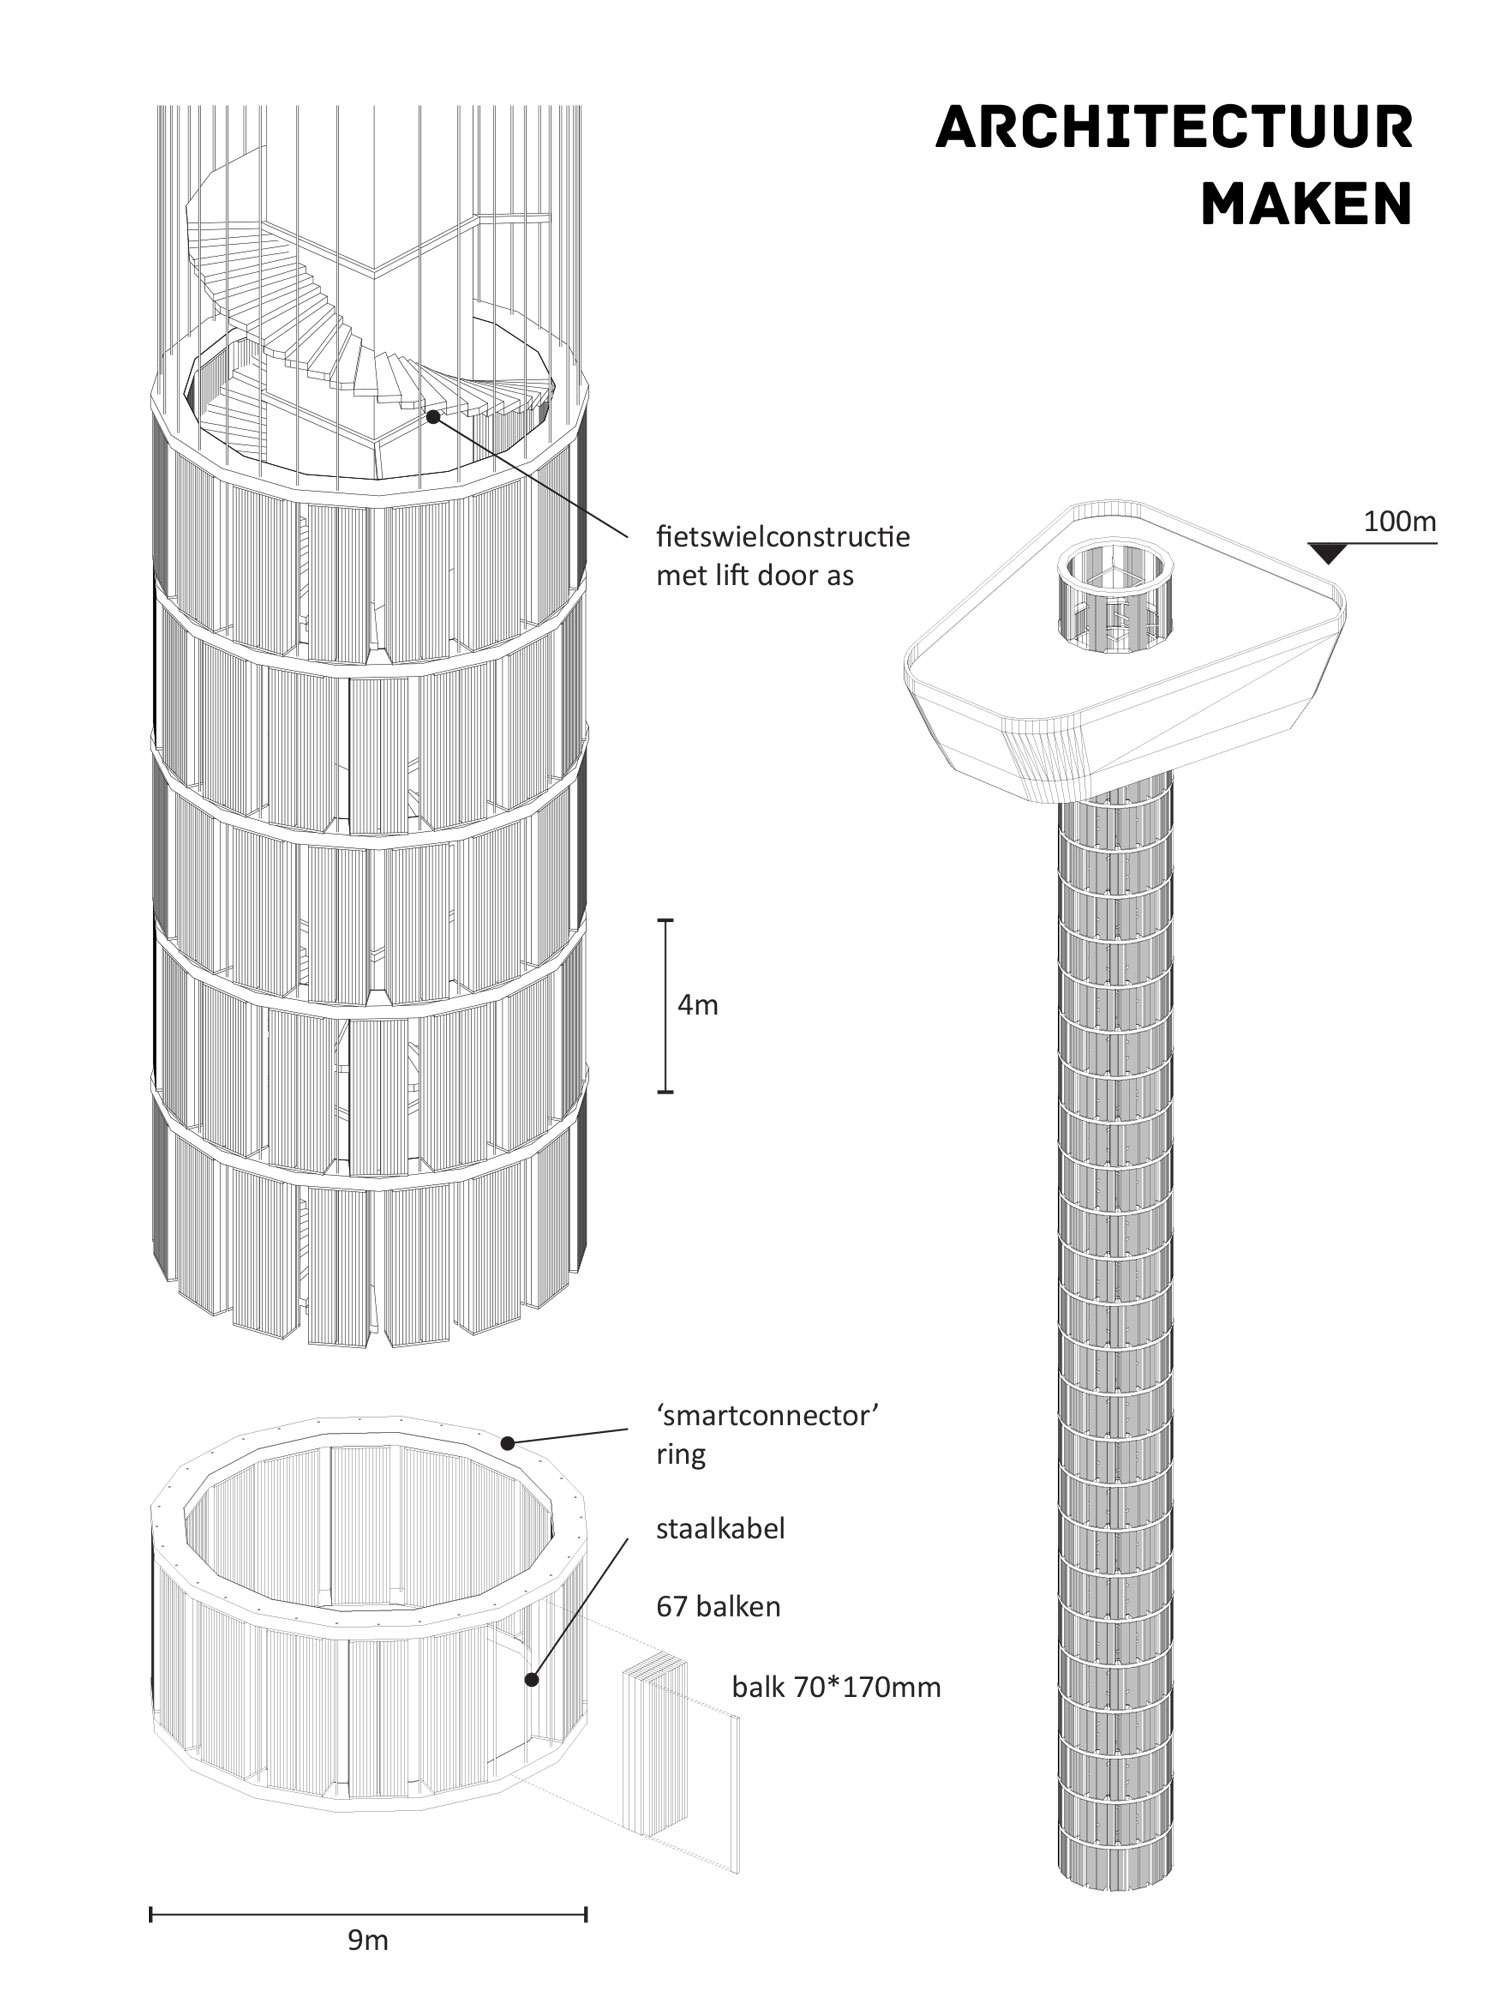 fabcity_euromast_f_architectuurmaken